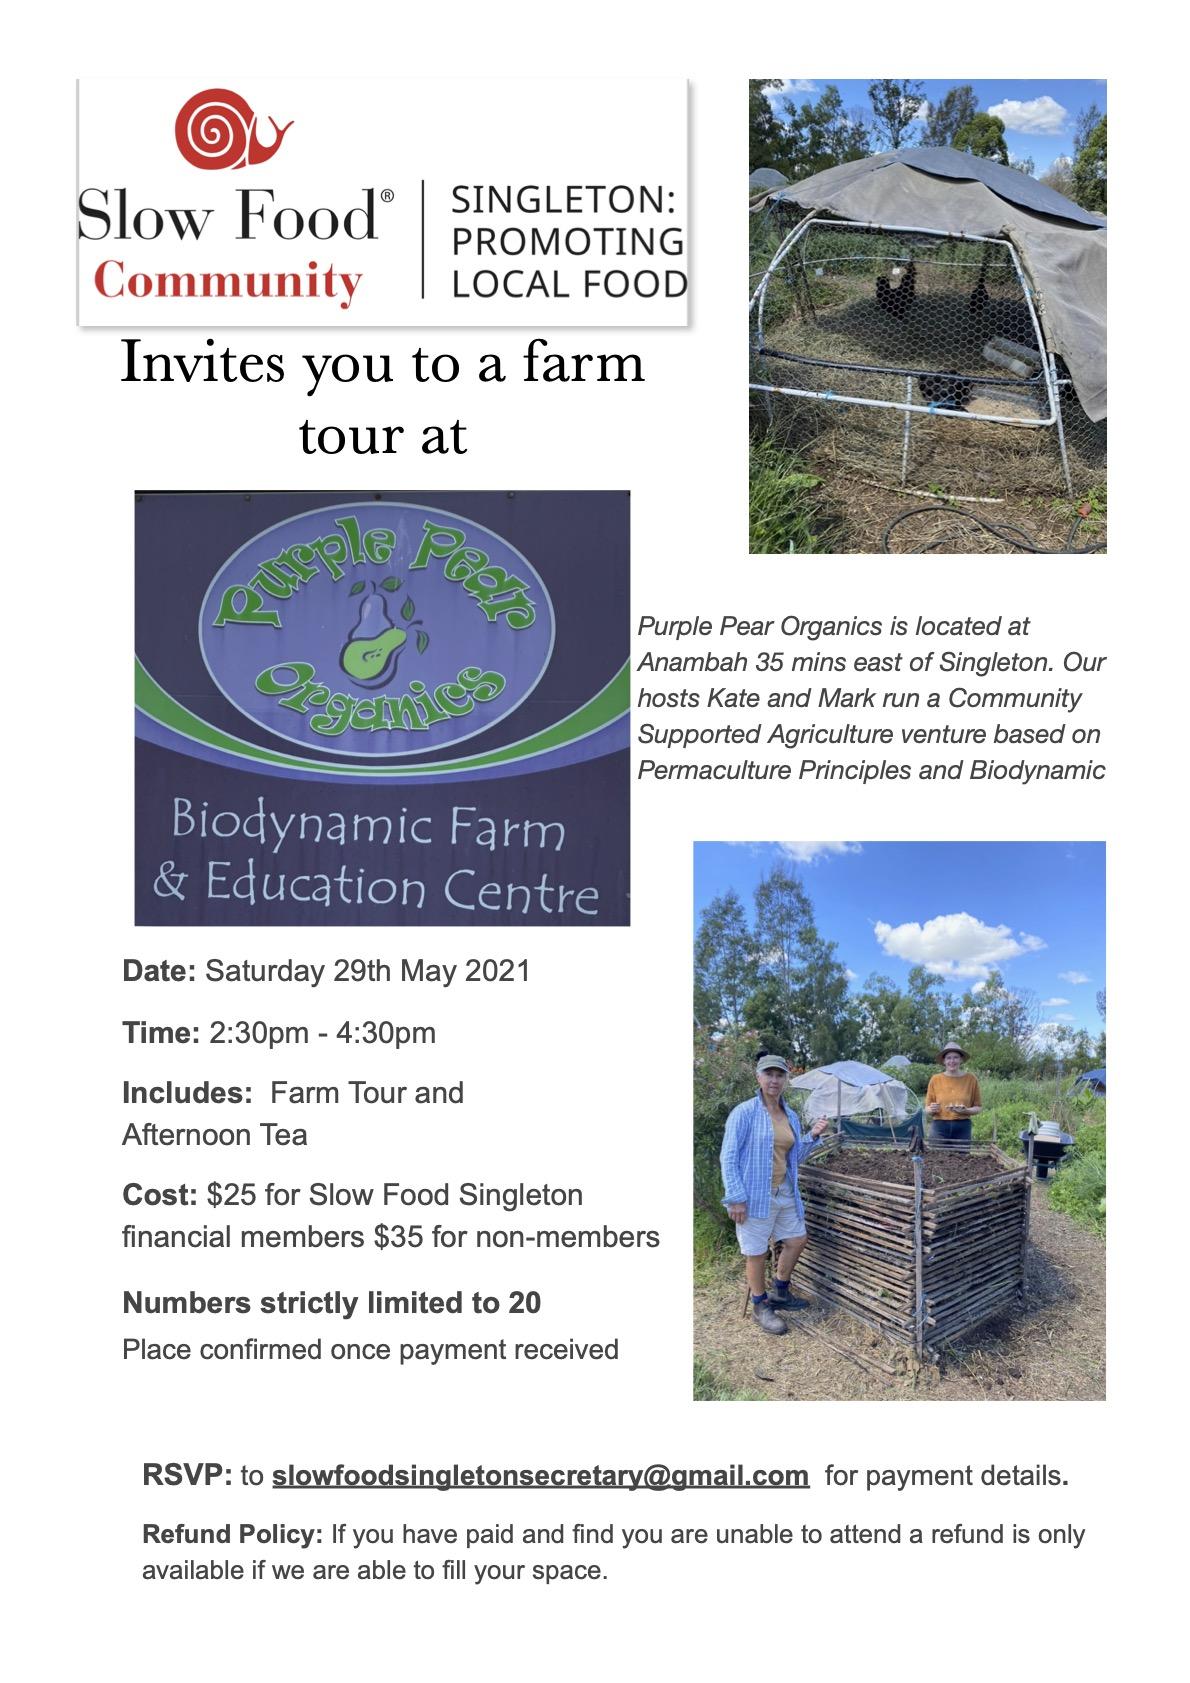 Slow-good-community-Slow-Food-Tour-HRLN